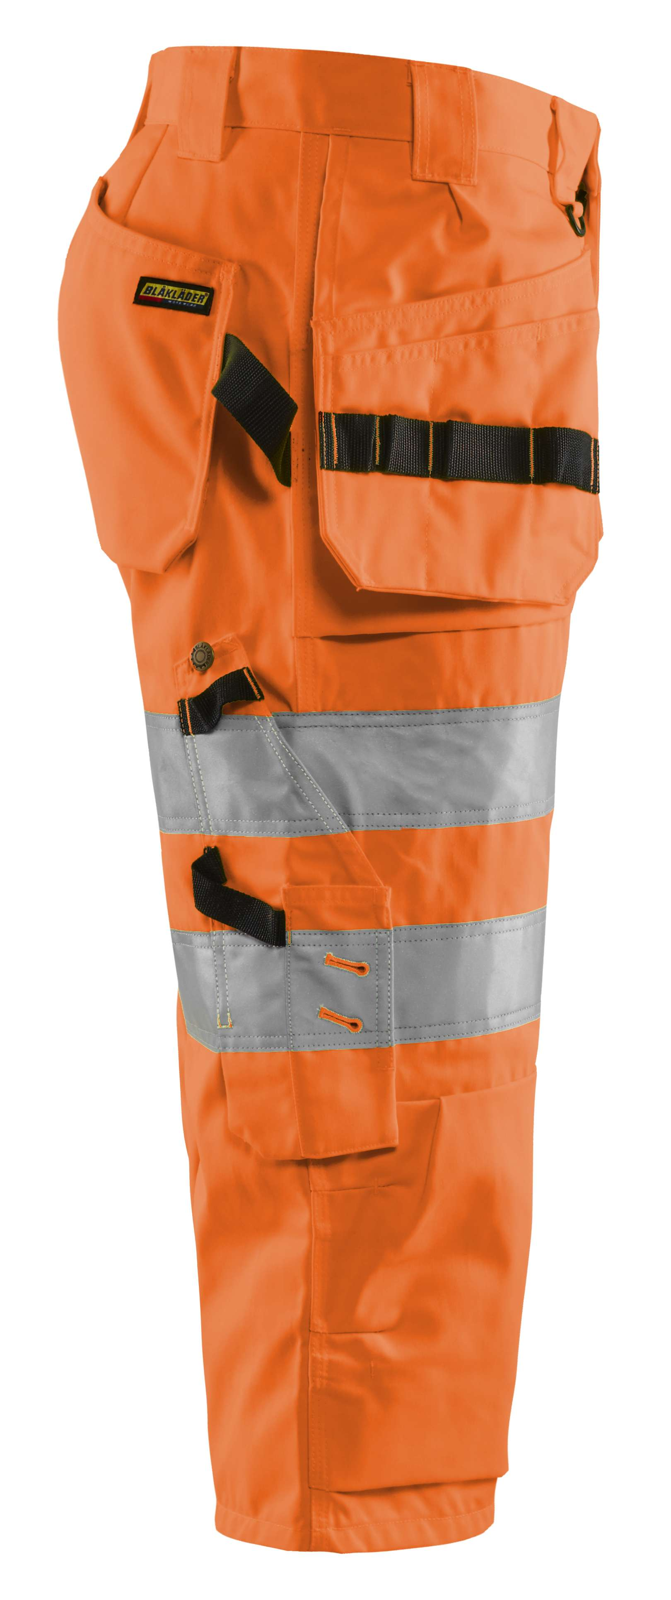 Blaklader Broeken 15391804 High Vis oranje(5300)